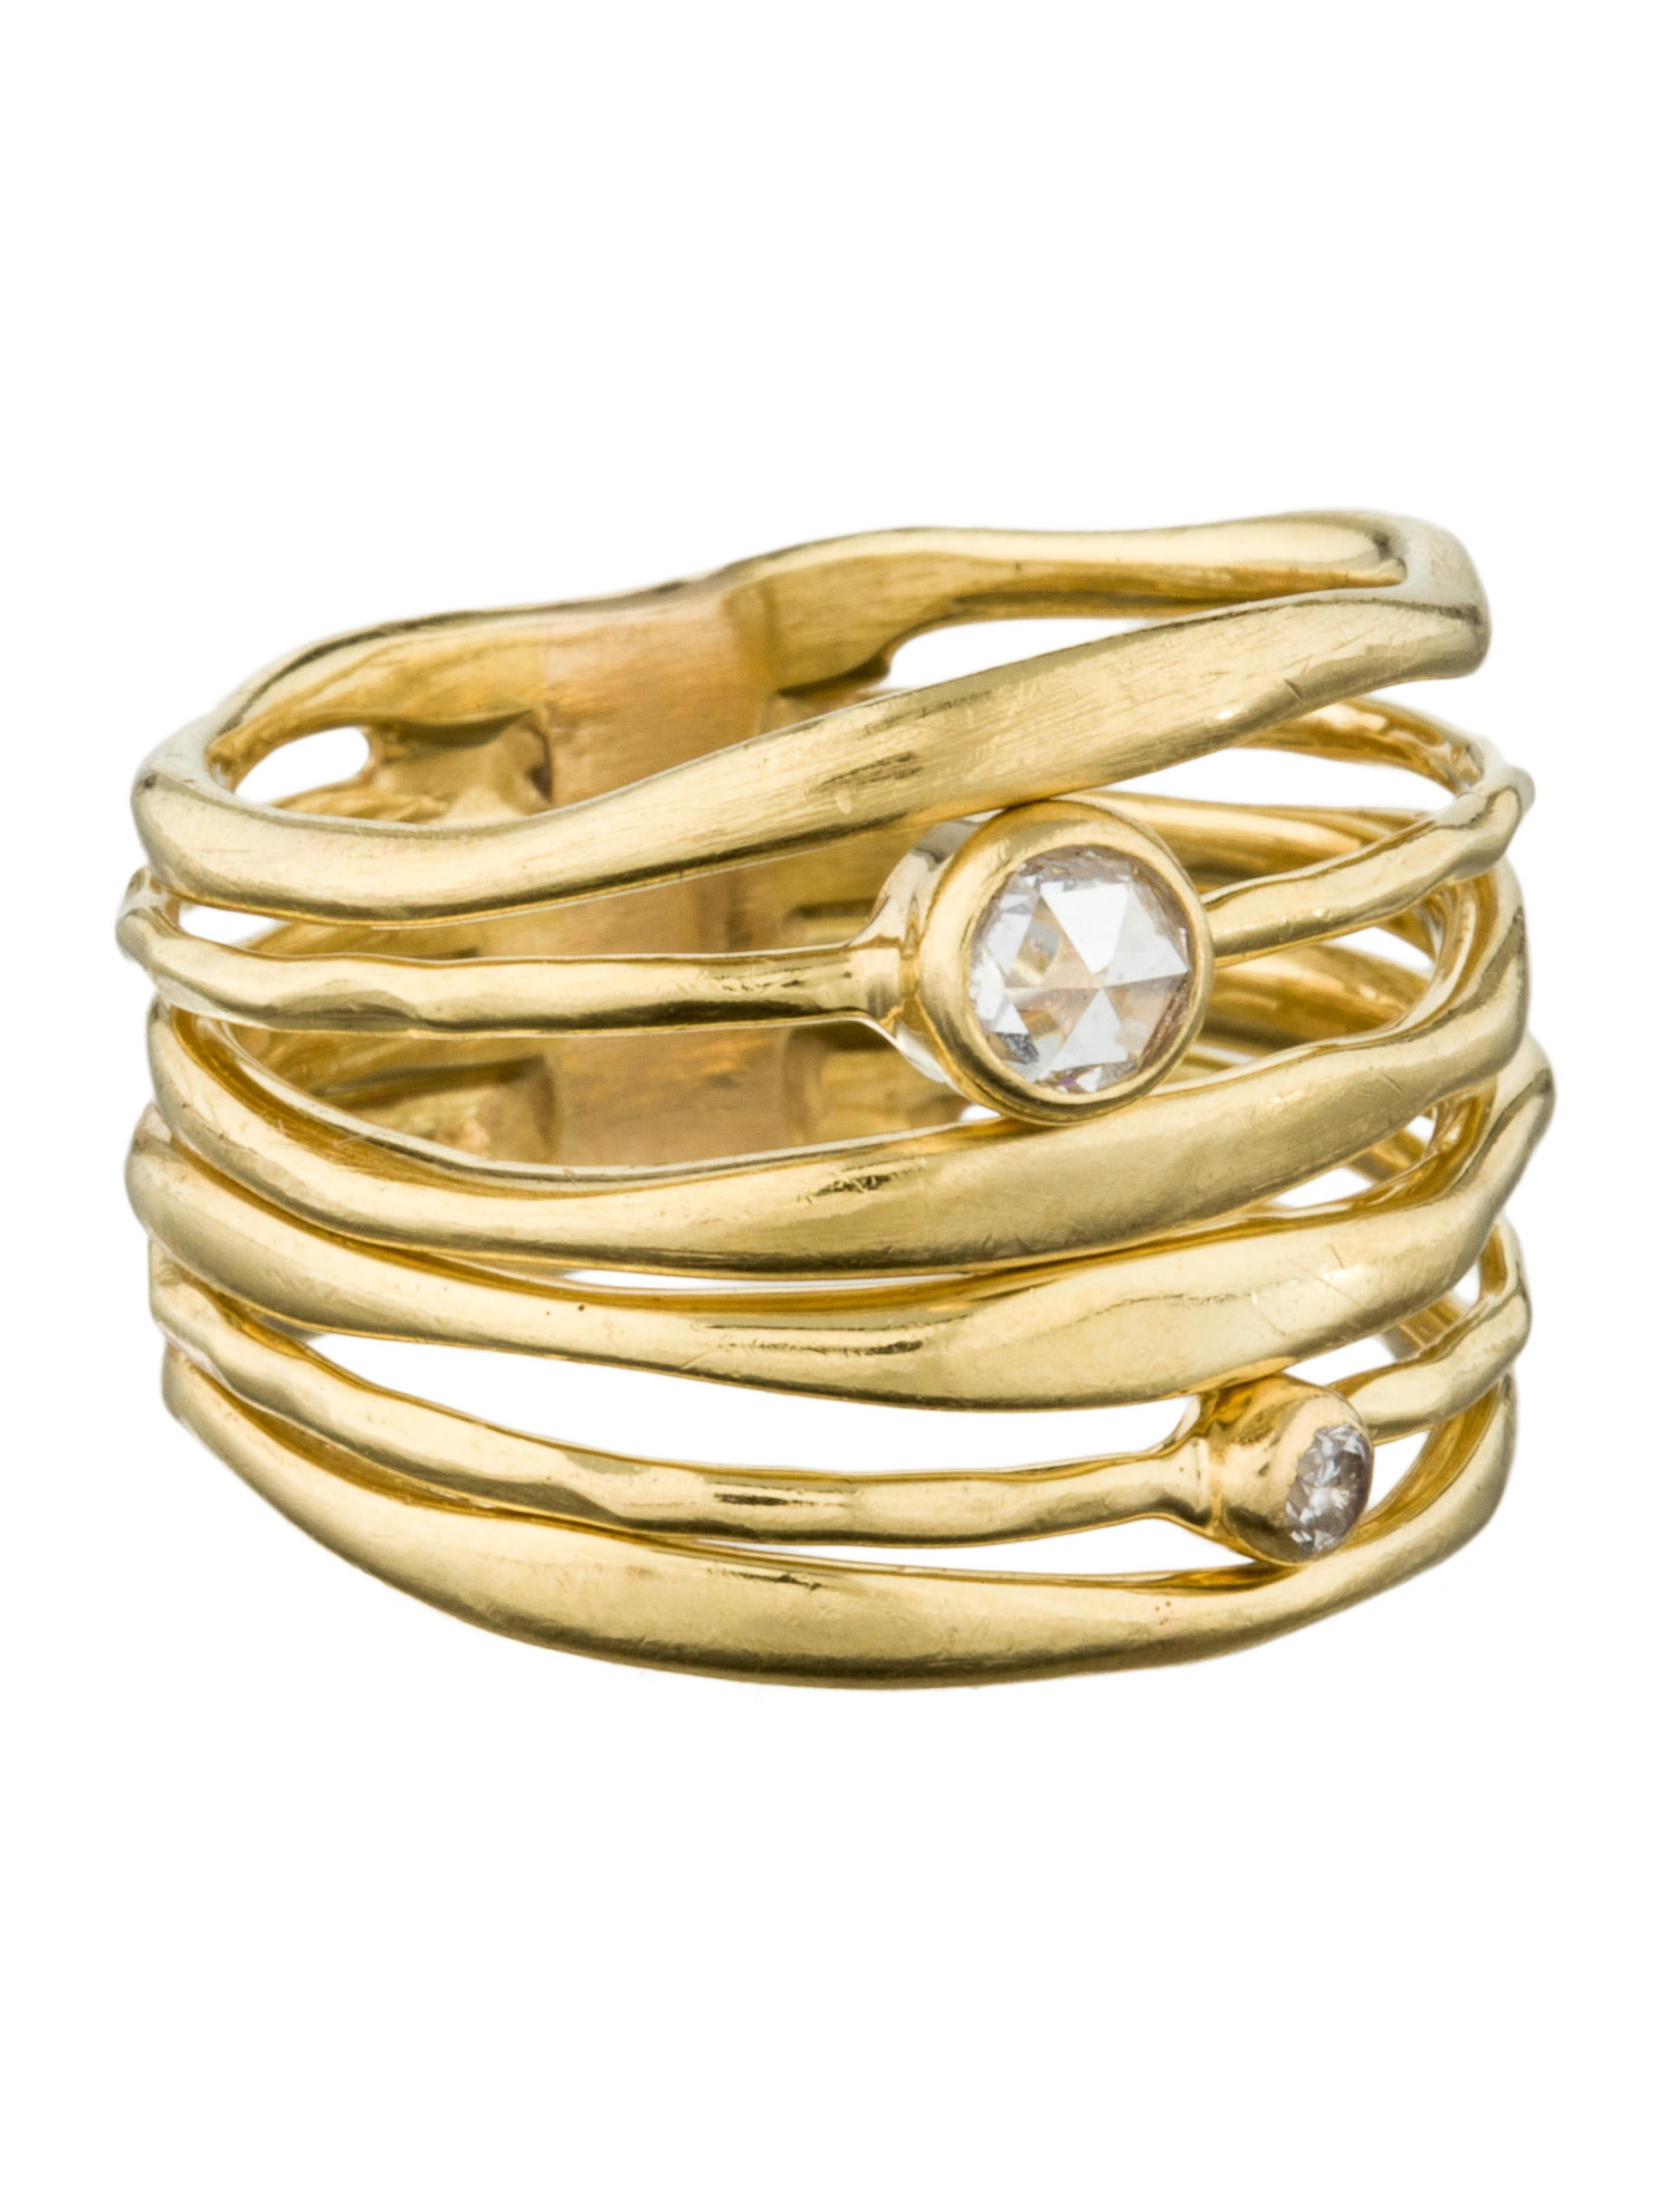 Ippolita Movie Star Stacked Ring  Rings  Ipp22723  The. Big Stone Rings. Million Dollar Wedding Rings. Mehendi Rings. Lore Rings. Promise Ring Engagement Rings. Winter Inspired Engagement Engagement Rings. 4 Man Wedding Rings. Coprolite Rings